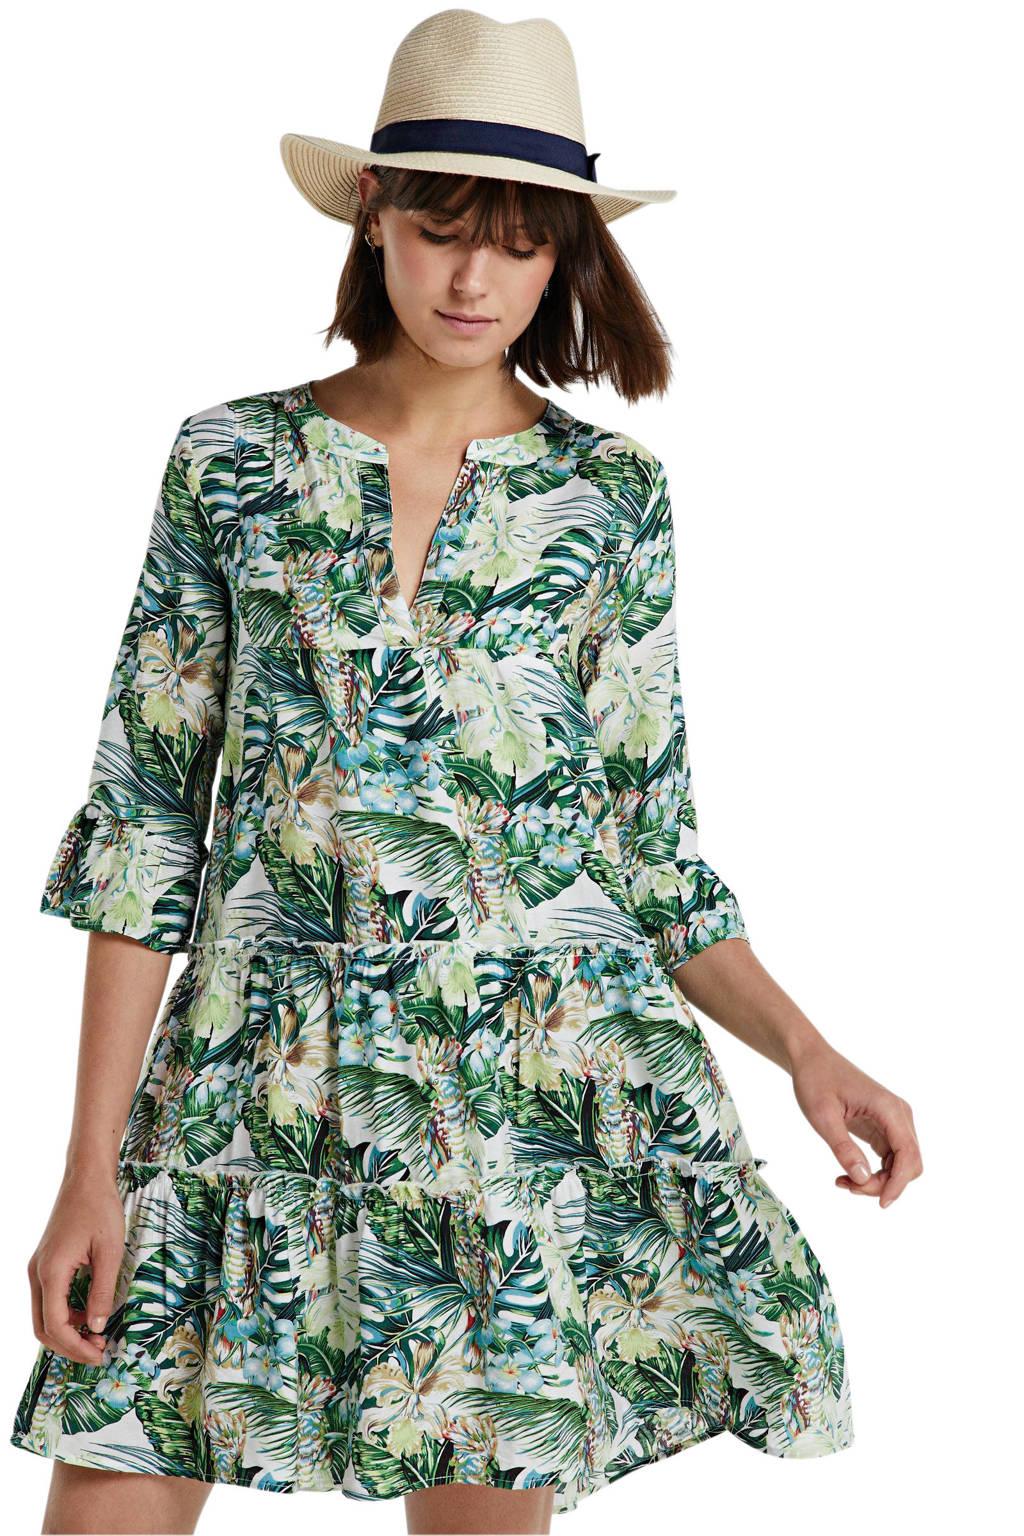 Smashed Lemon jurk met all over print en volant groen/wit, Groen/wit